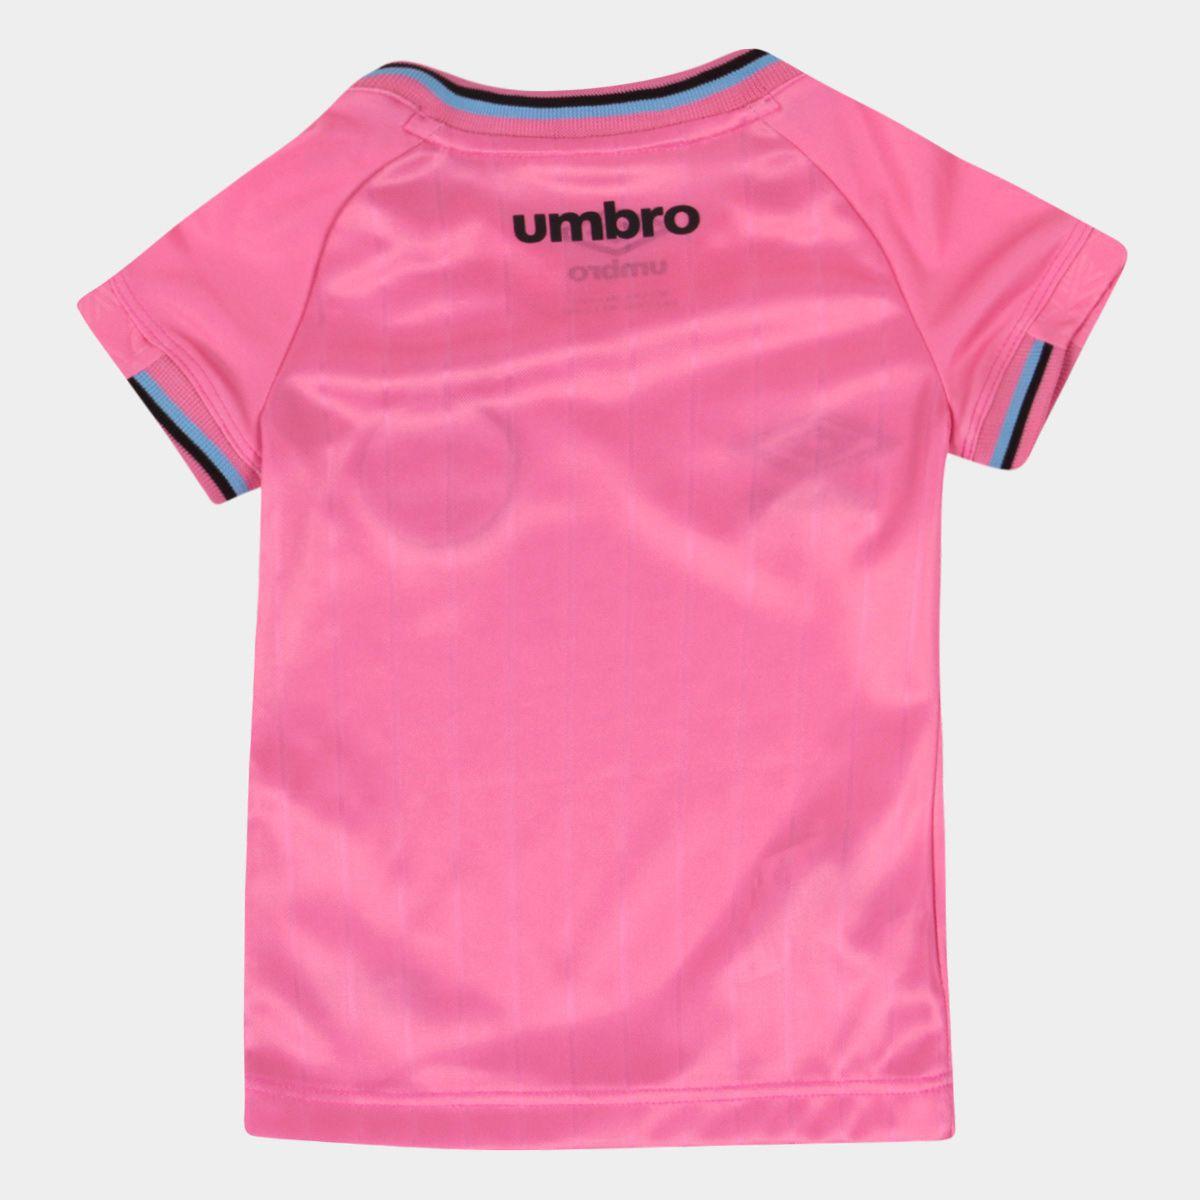 Camiseta Umbro Grêmio Outubro Rosa 2018 Feminina Juvenil